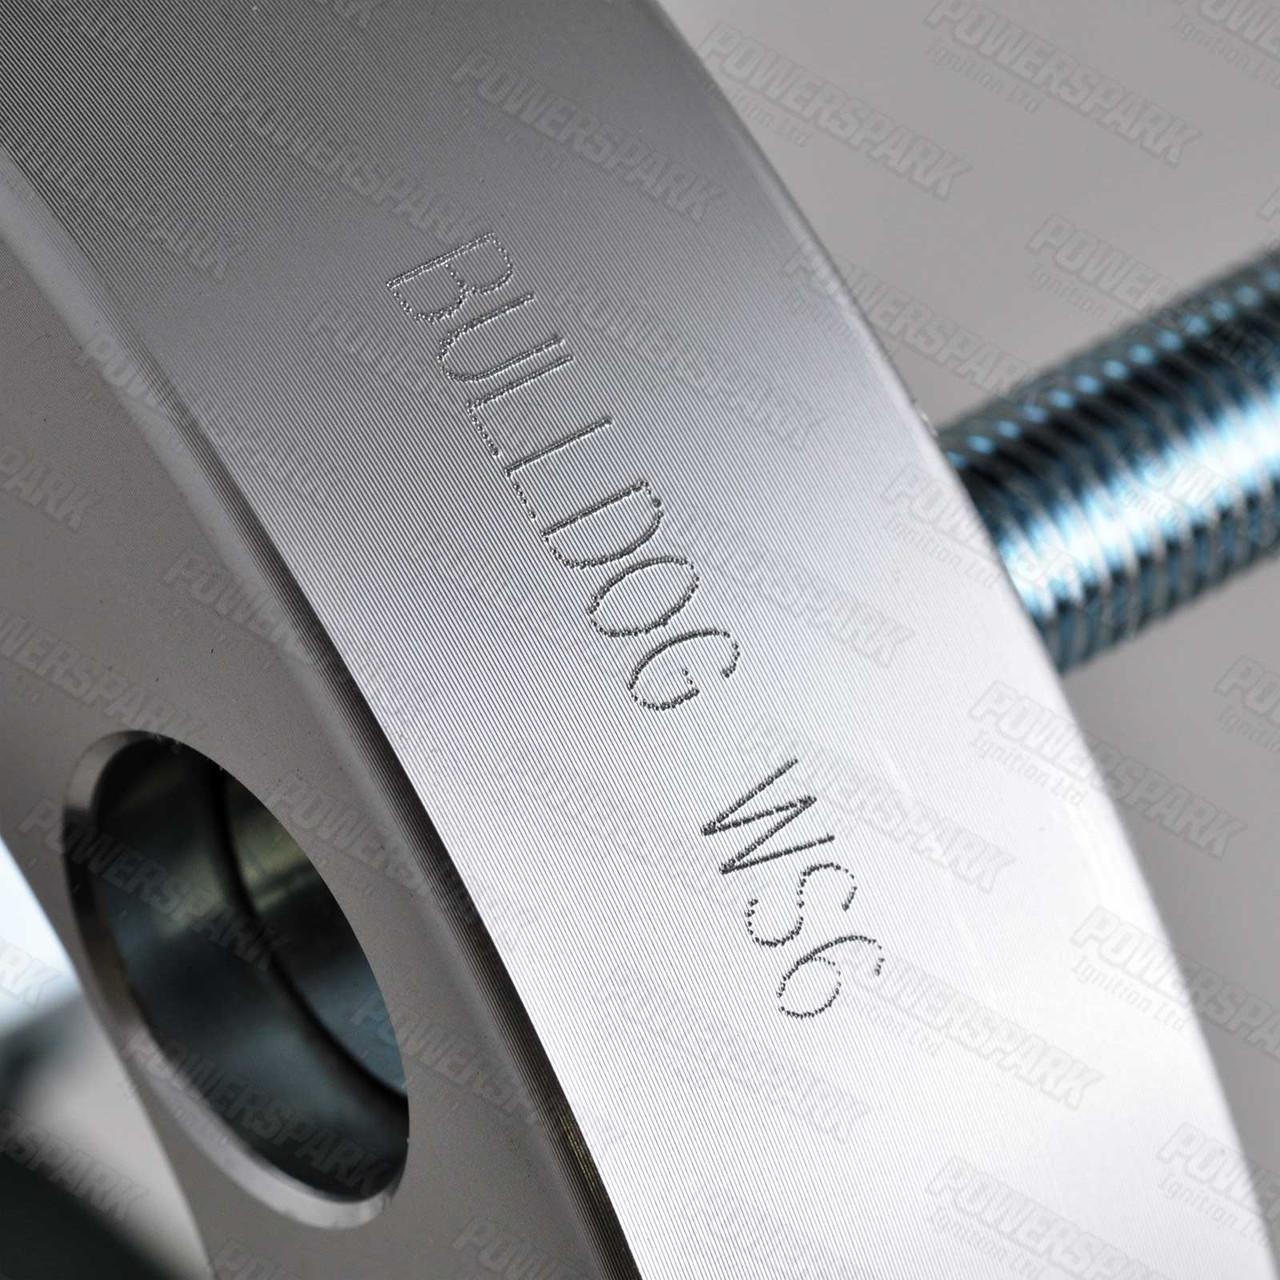 4 Bulldog 30mm Wheel Spacers To Fit 6 Stud Toyota, Mitsubishi, Isuzu, Ford, Vauxhall 4x4 Vehicles